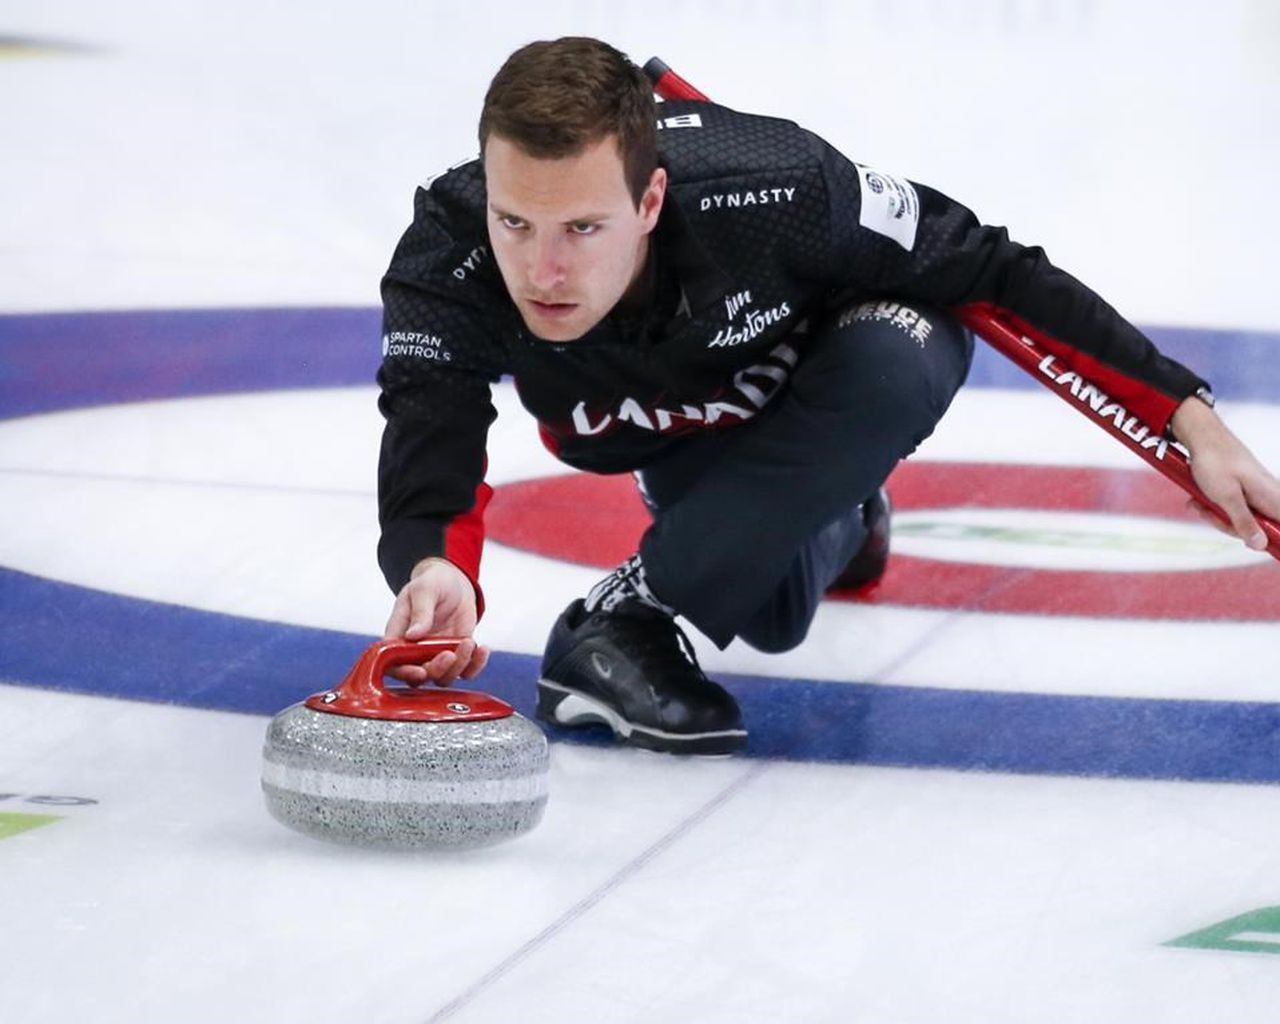 Канадский мясник проиграл россиянину Глухову на чемпионате мира по керлингу среди мужчин